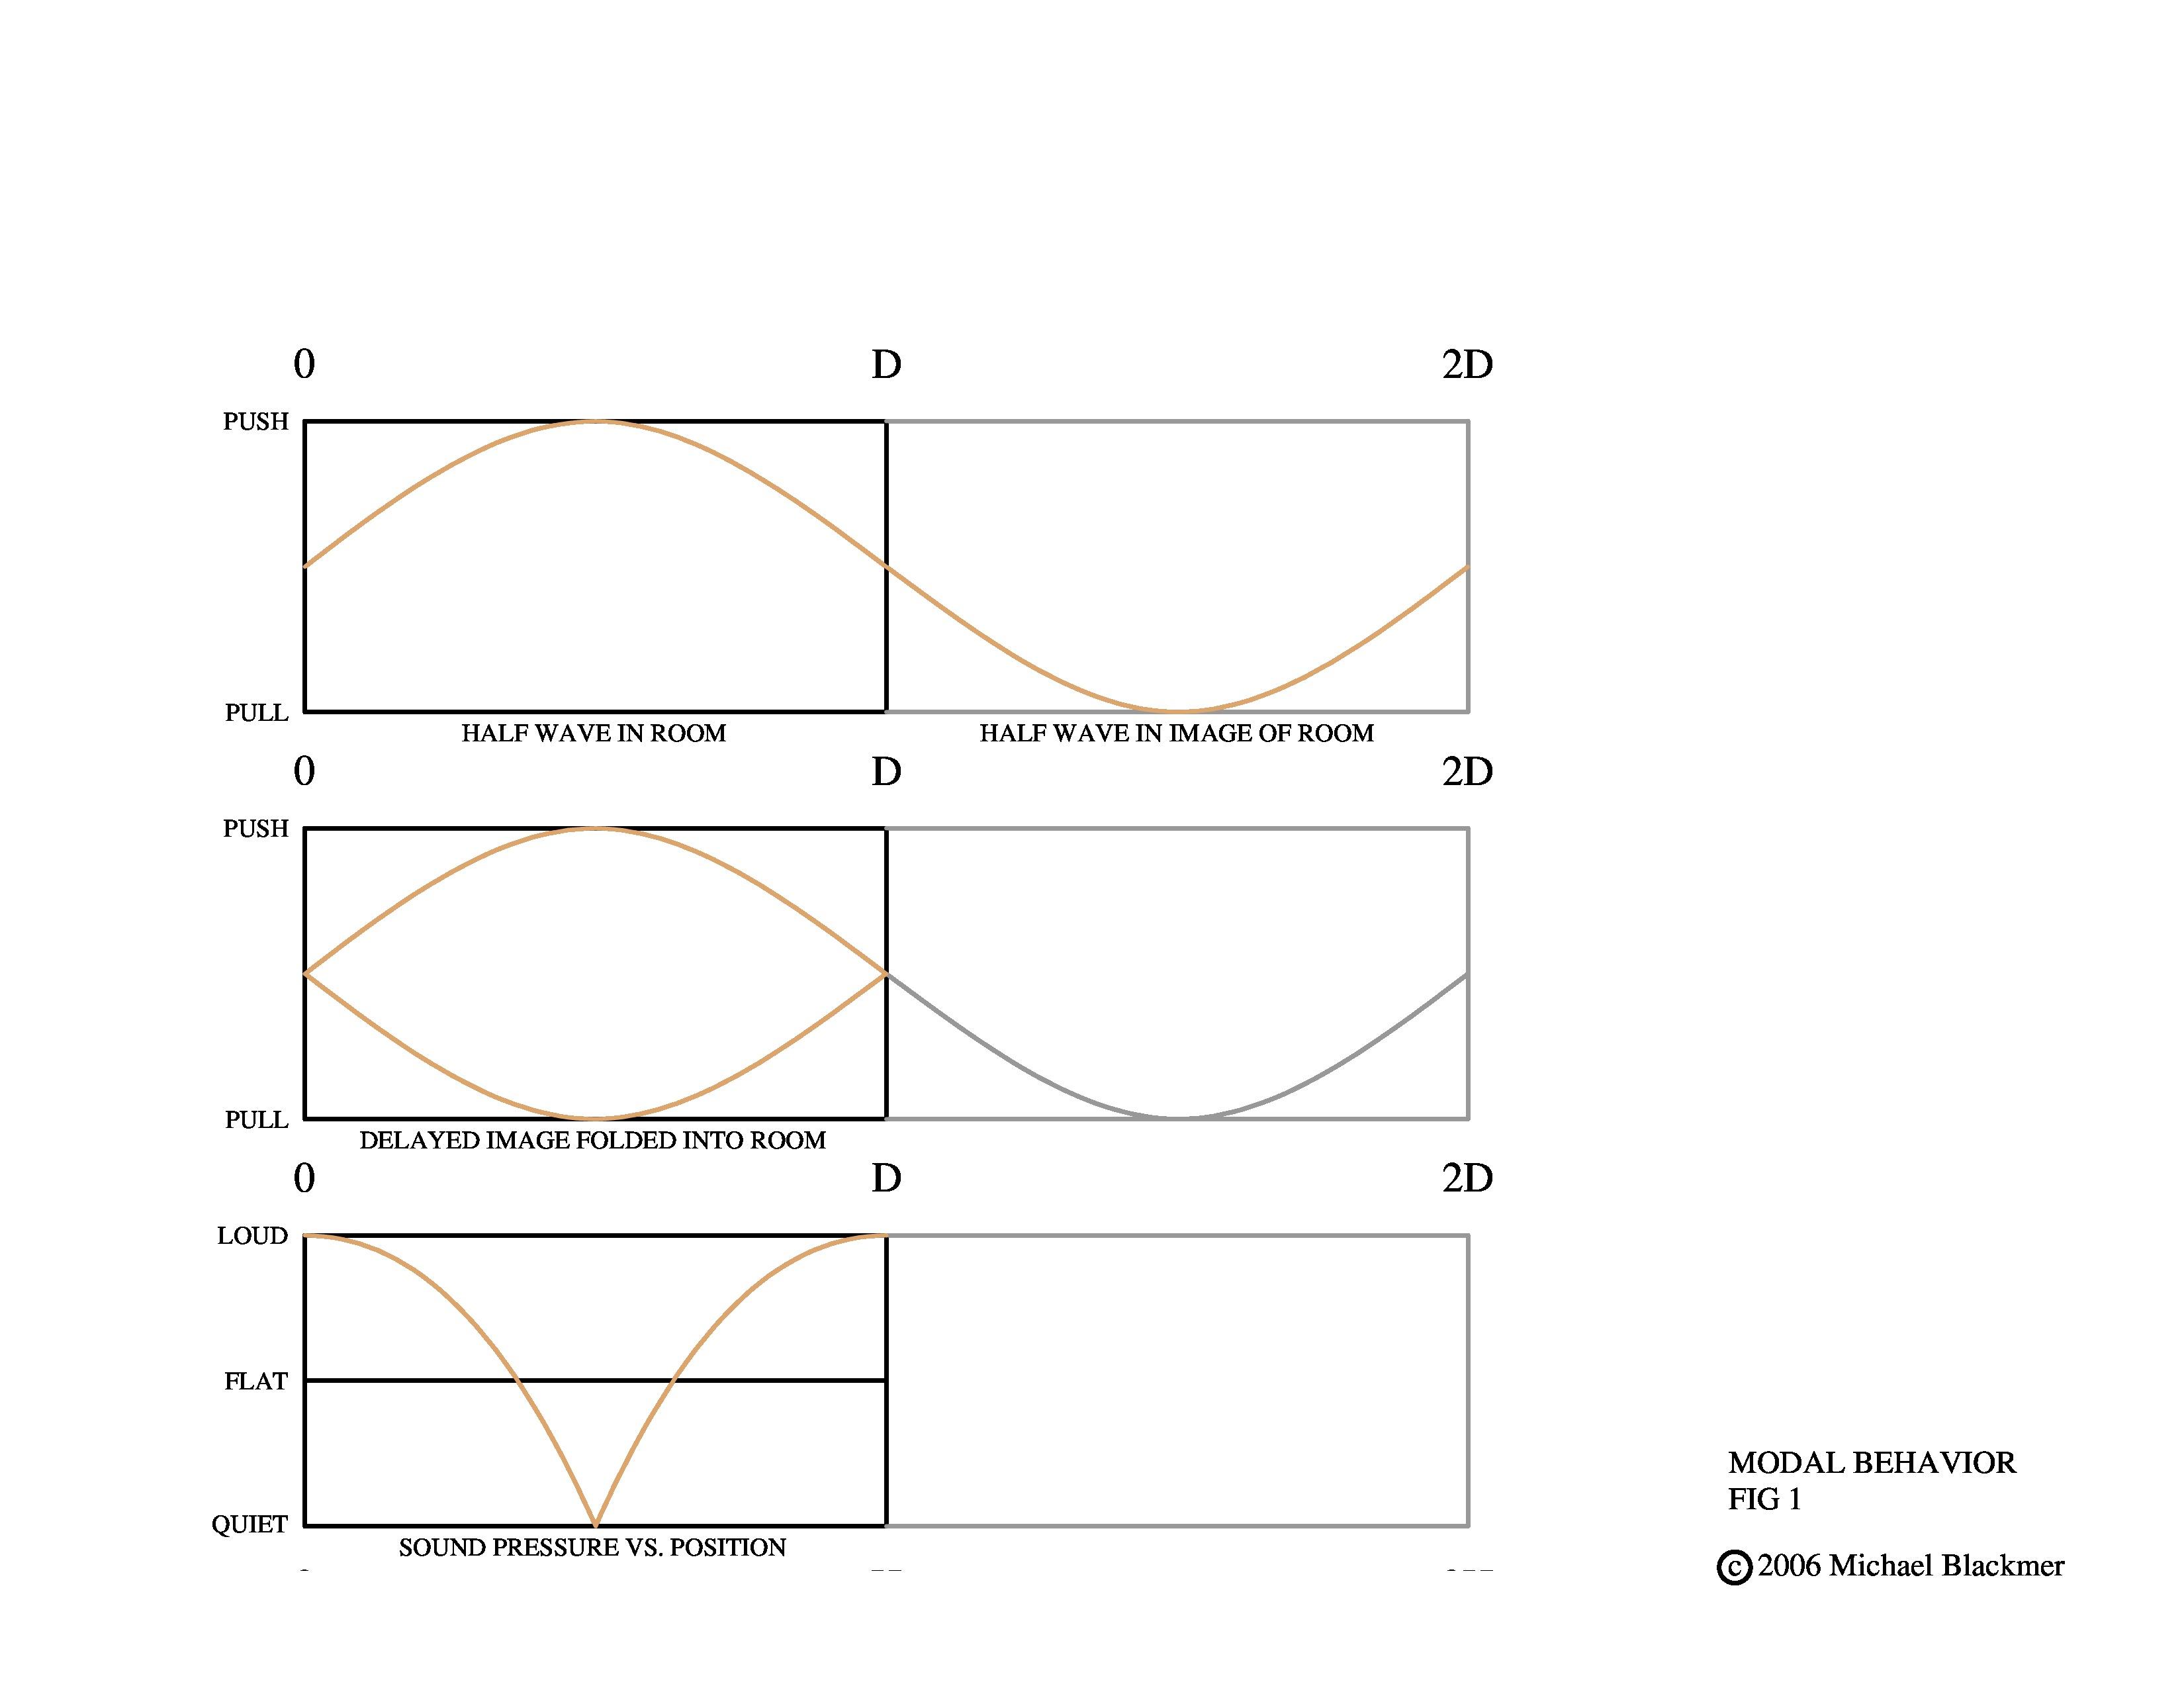 master-modal-behavior-demo-3-for-pad-fig-1-2-page-0